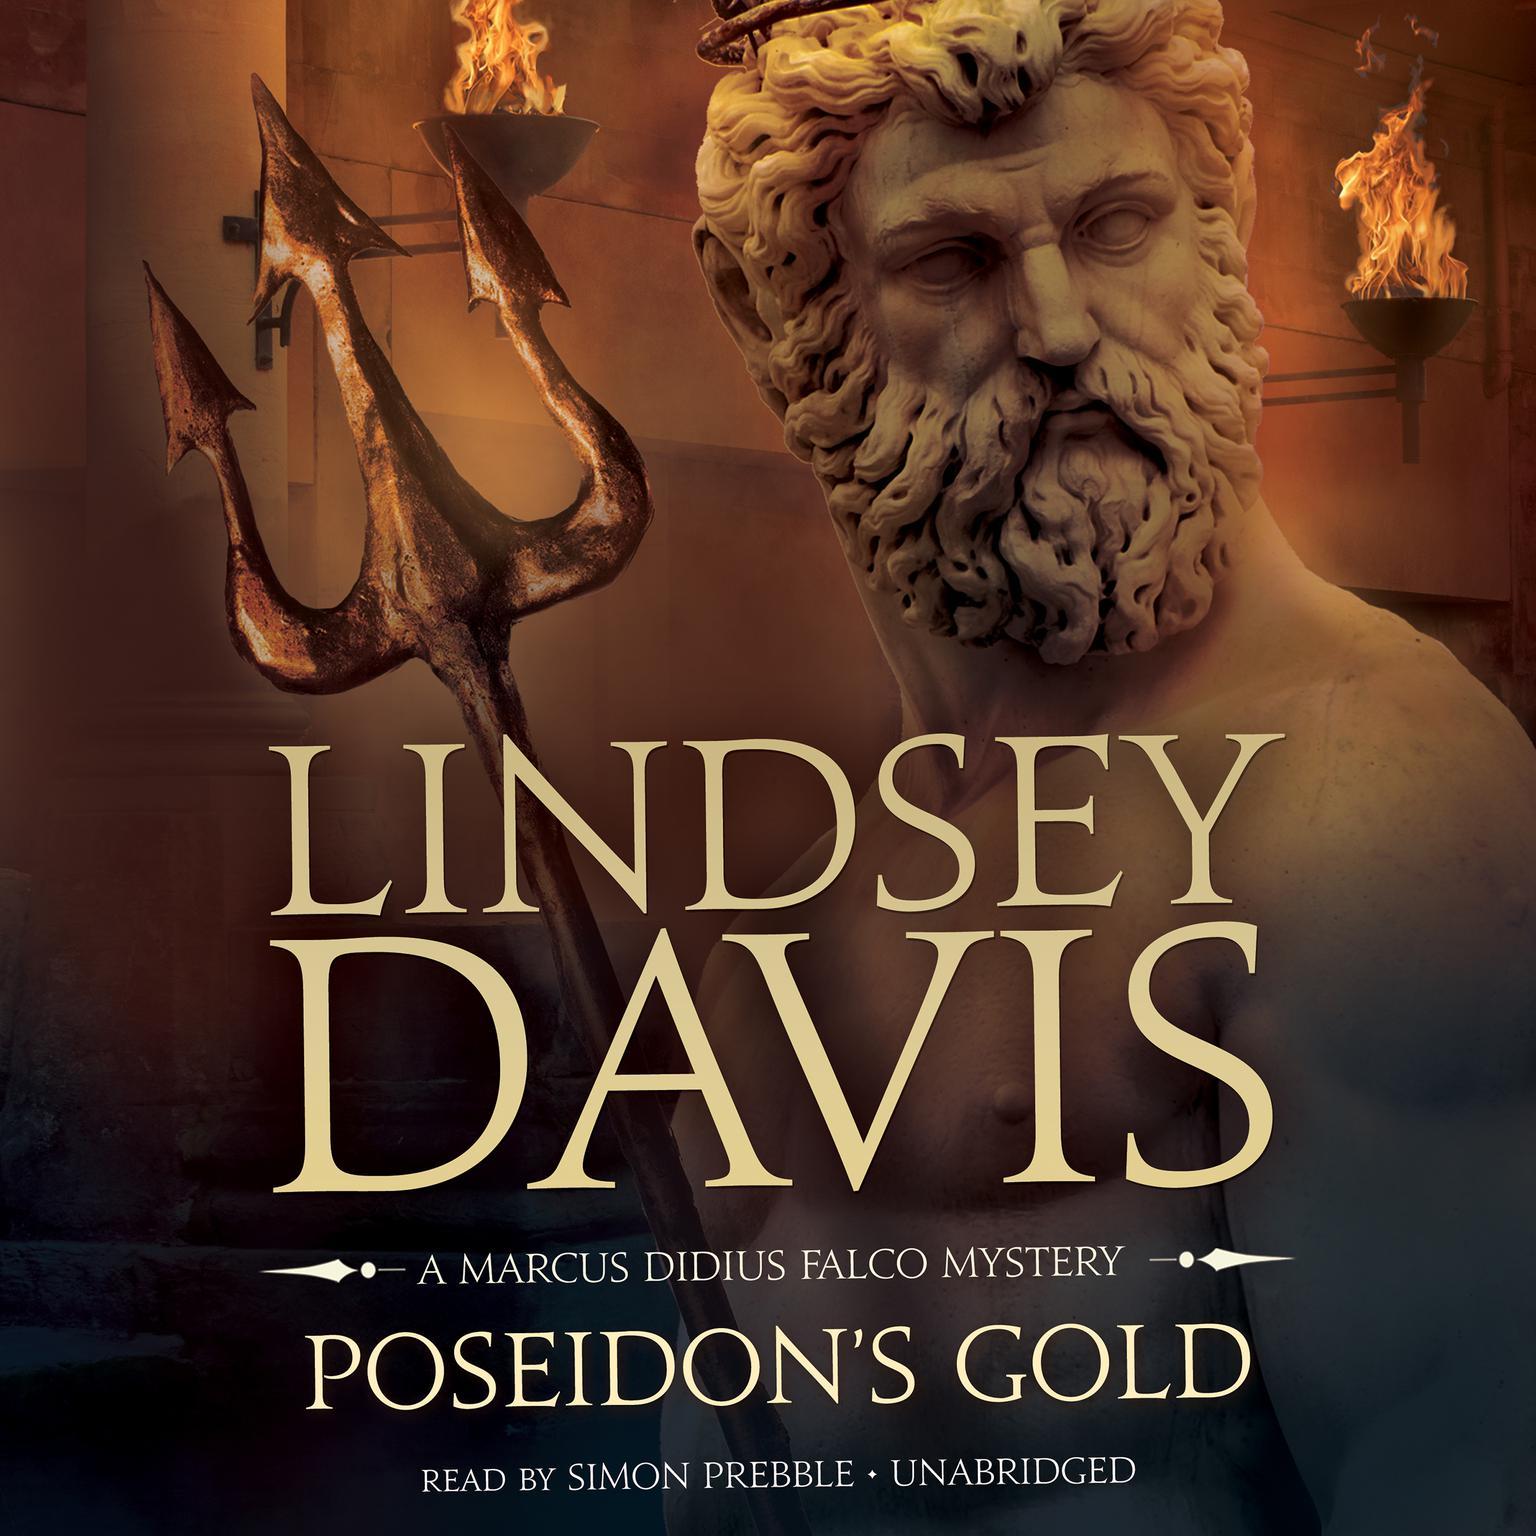 Poseidon's Gold Audiobook, by Lindsey Davis